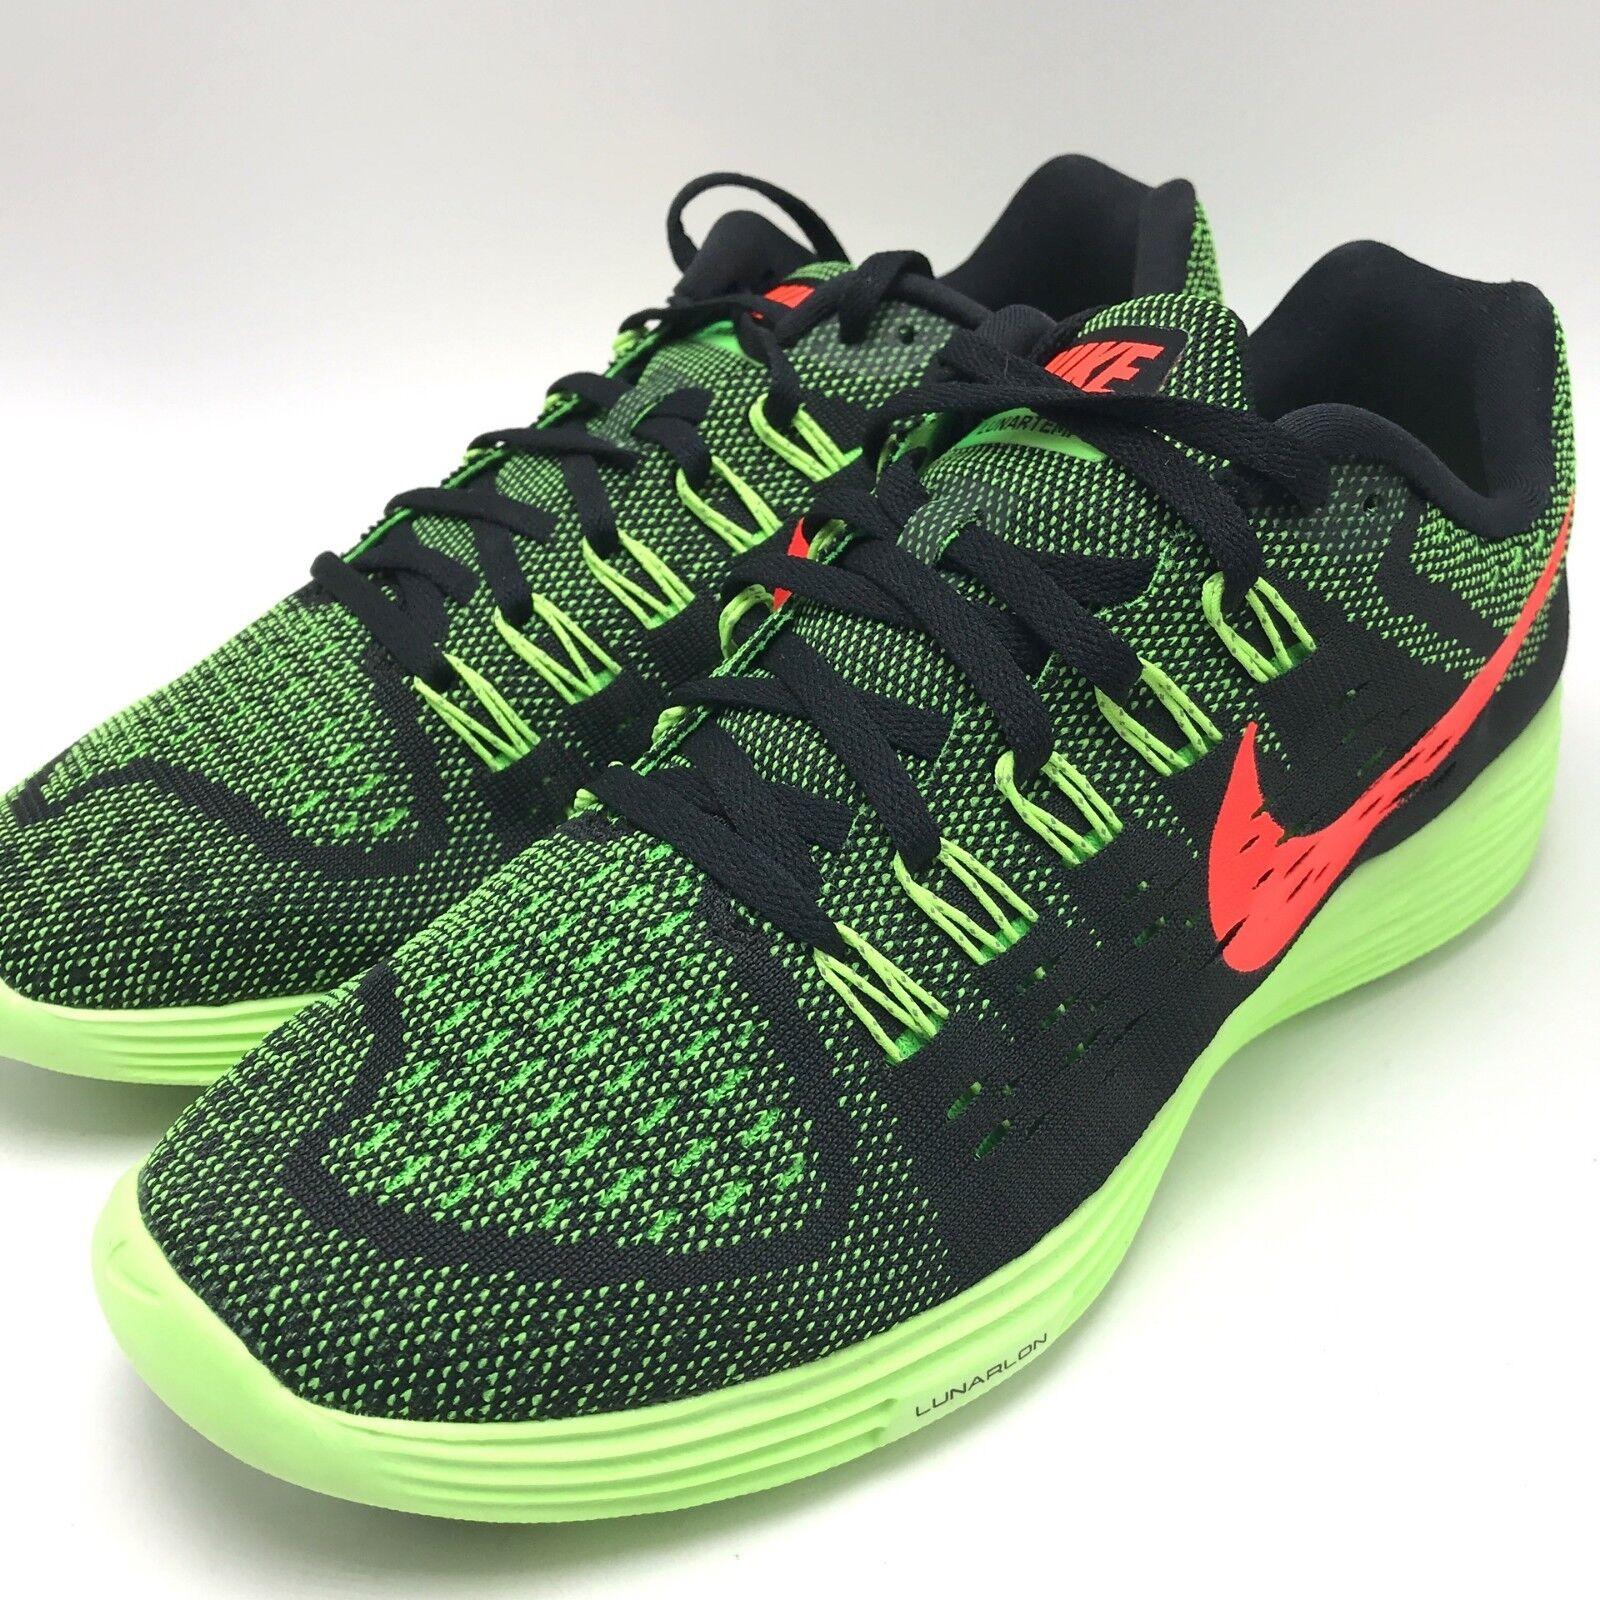 Nike Lunartempo Black Hyper orange-Green Strike Men's Running shoes 705461-006